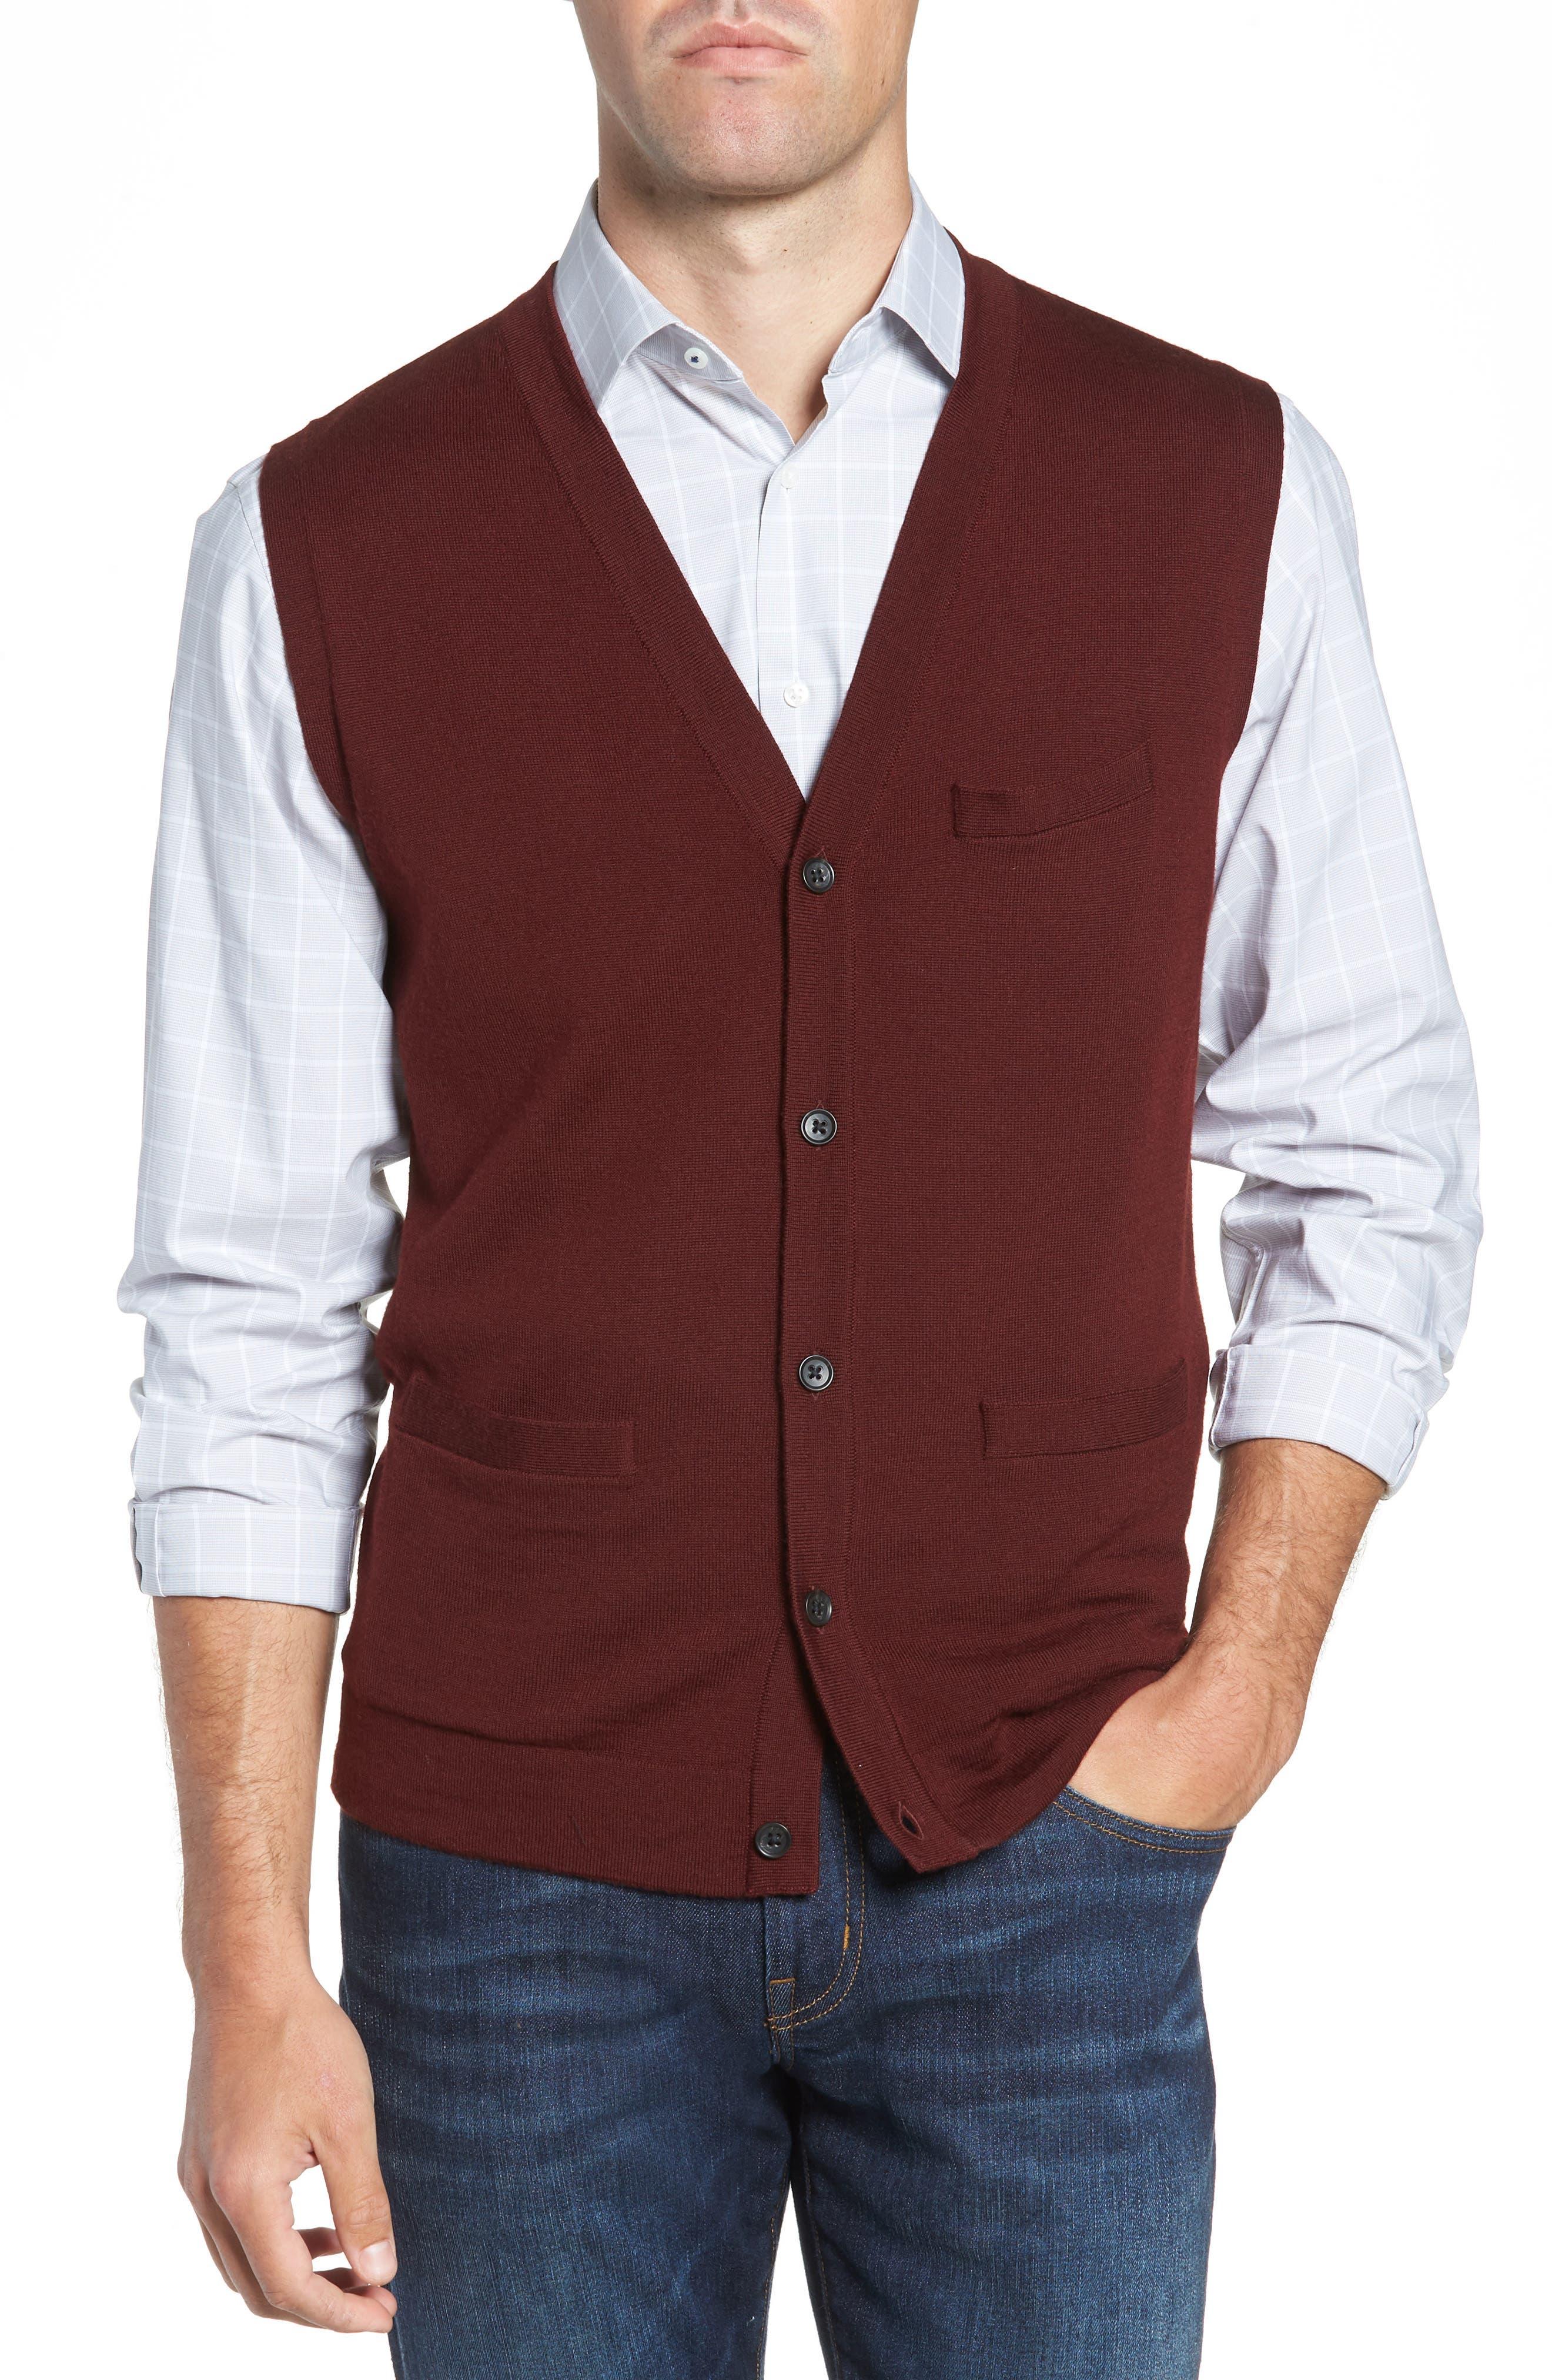 Merino Button Front Sweater Vest,                             Main thumbnail 1, color,                             930